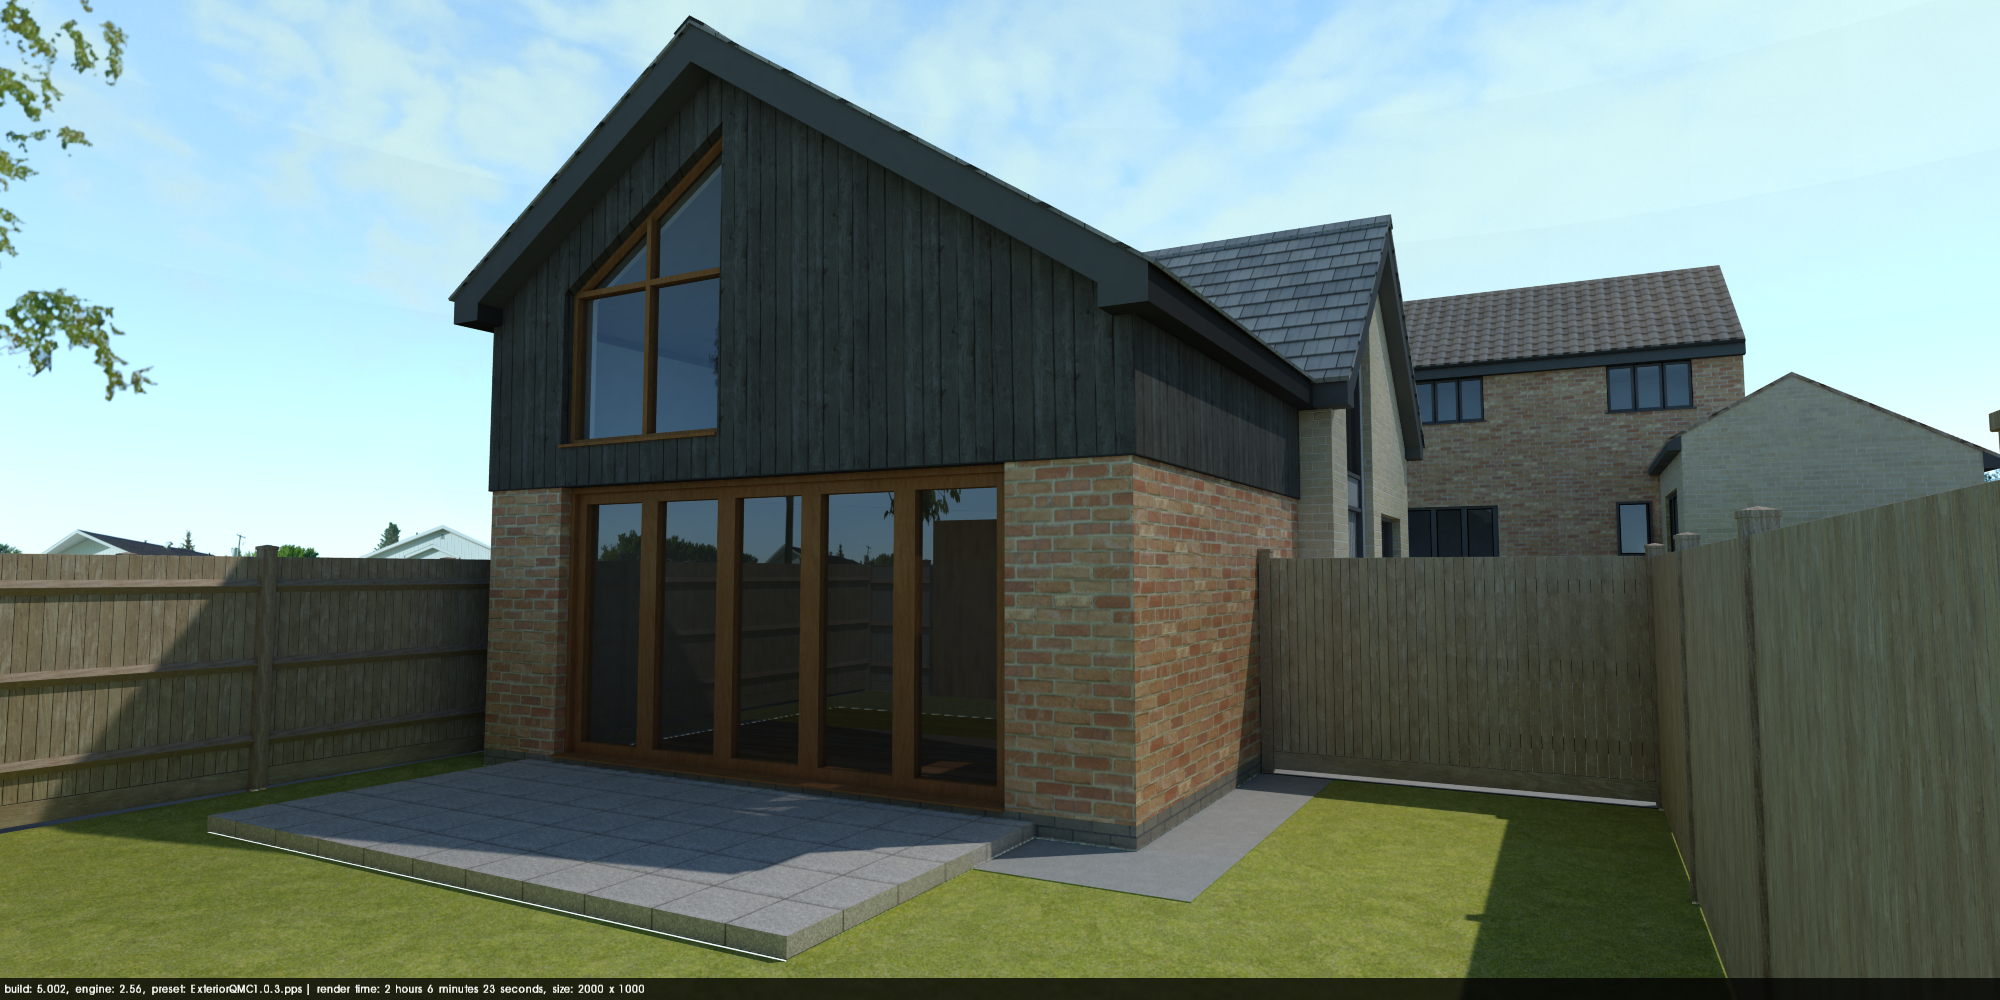 New build house, Hertfordshire